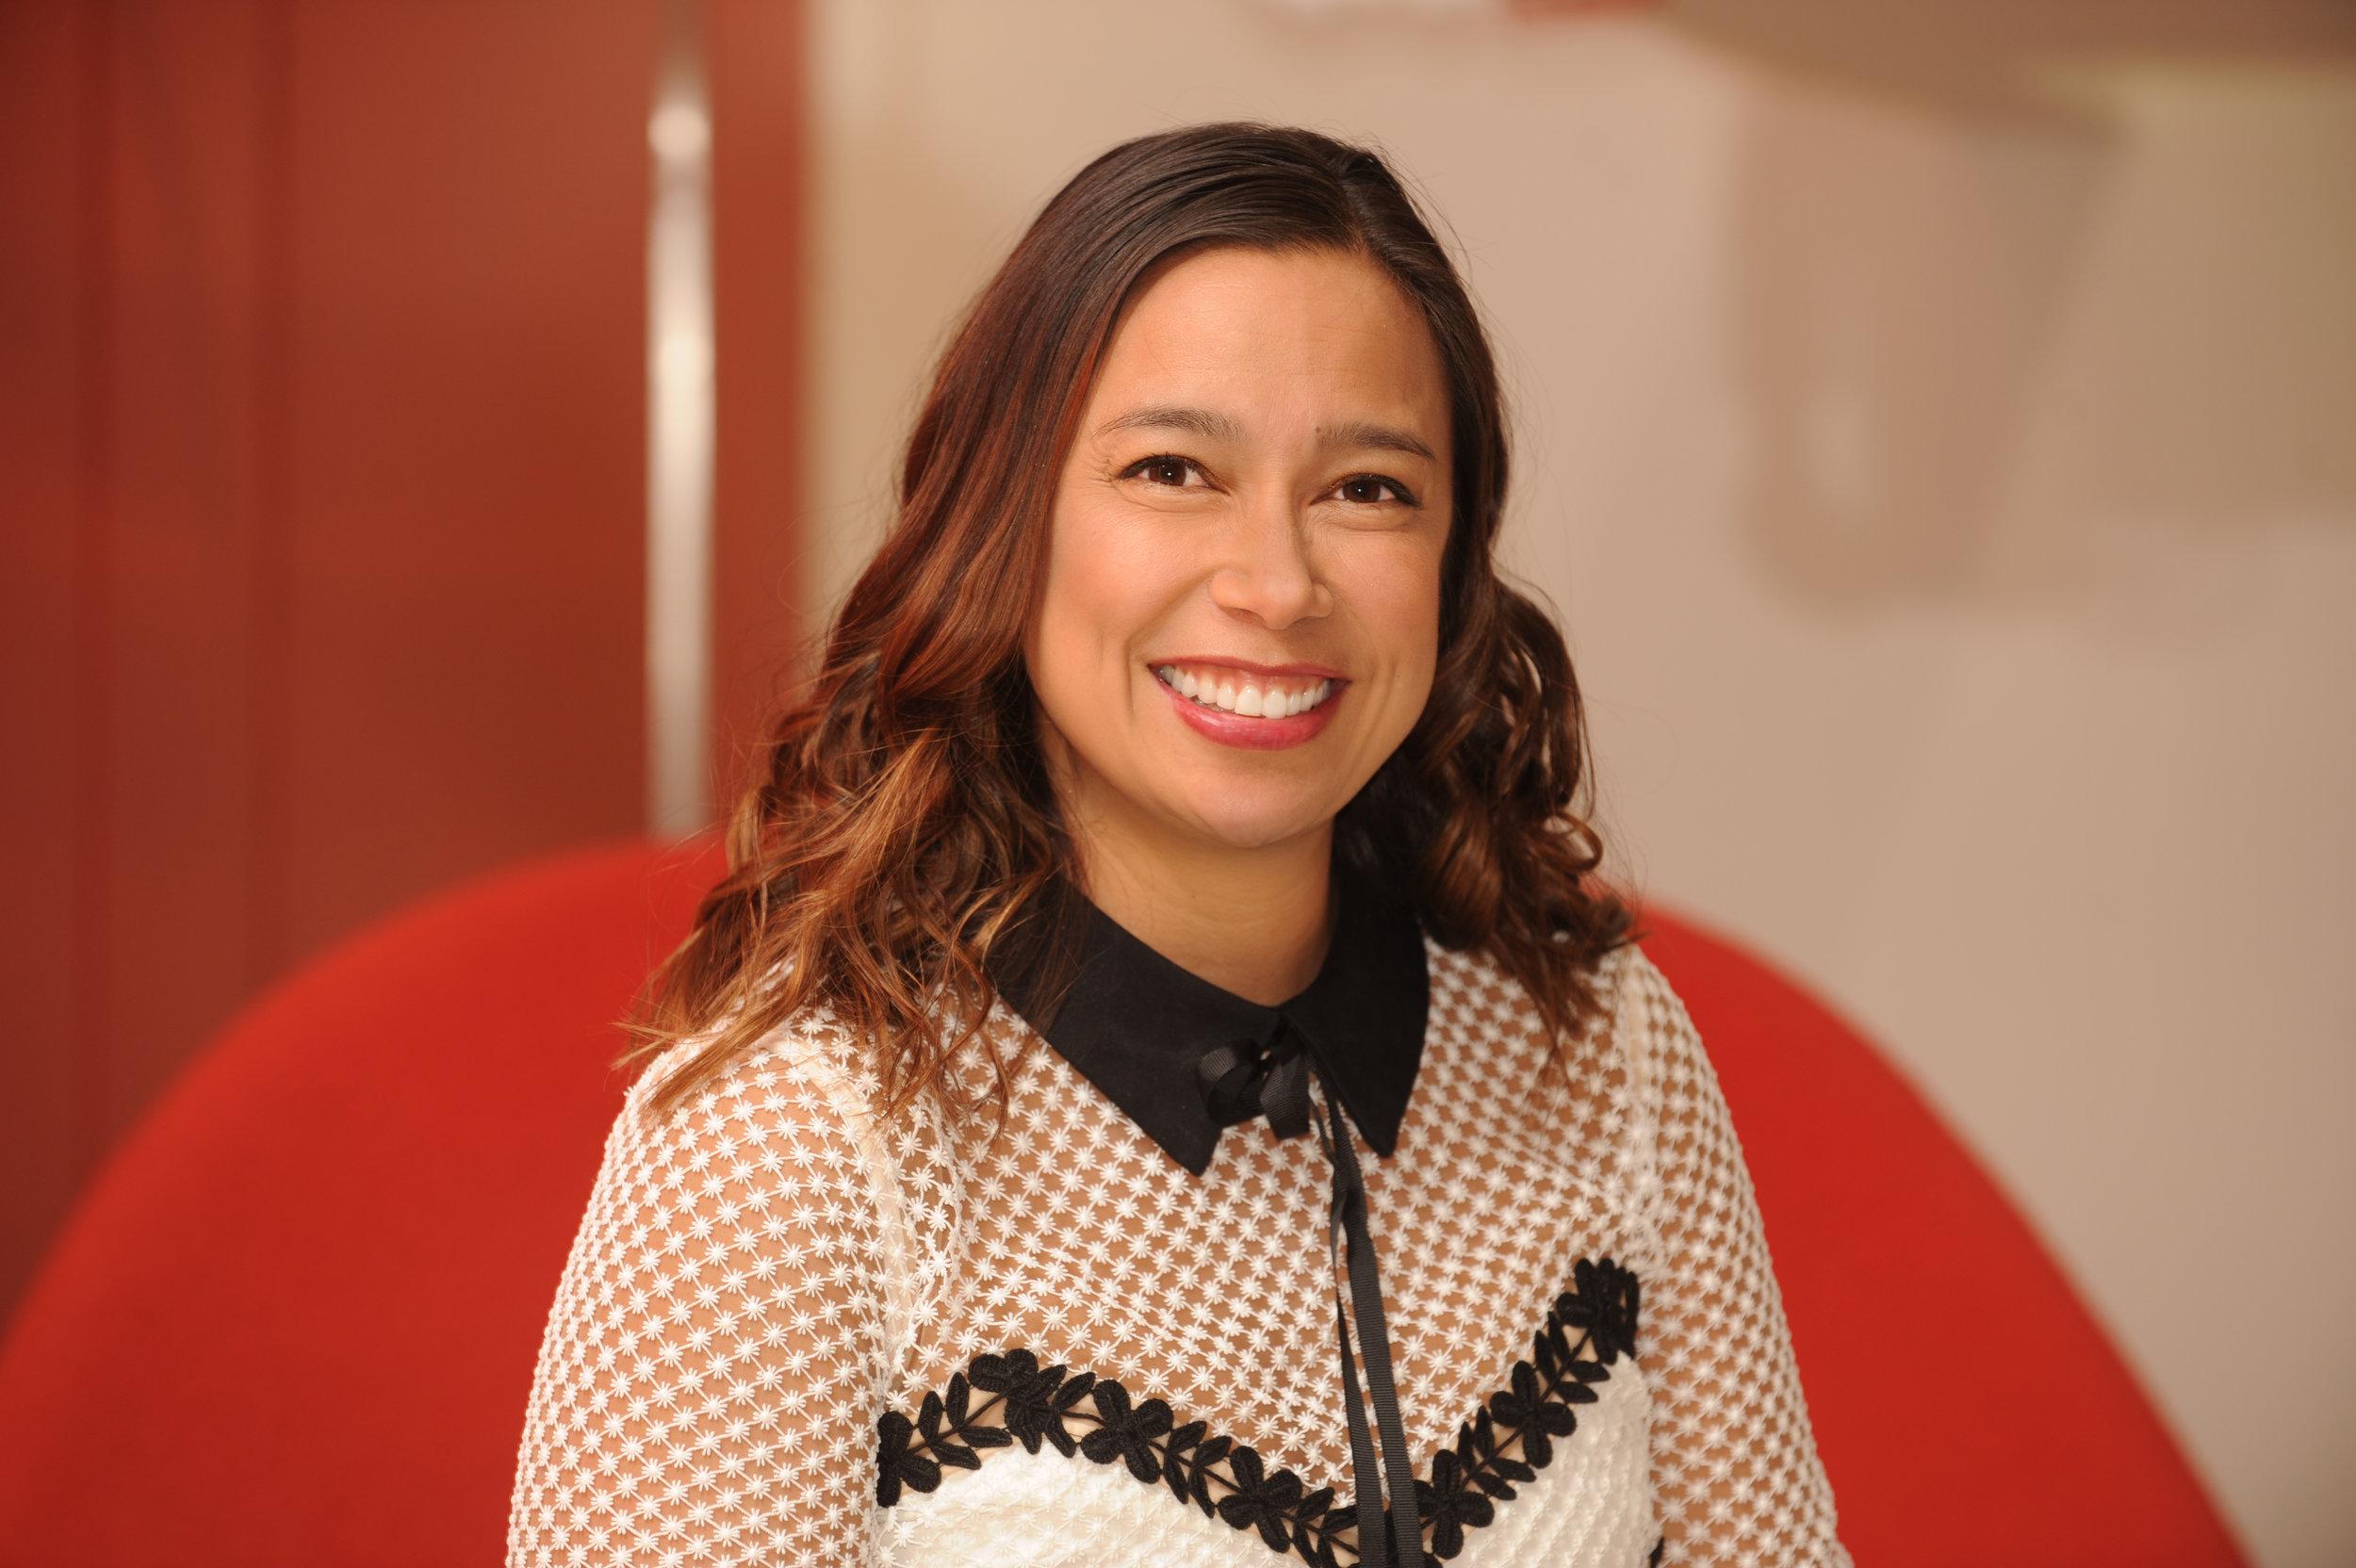 Michelle Bravin, Principal, KBM-Hogue